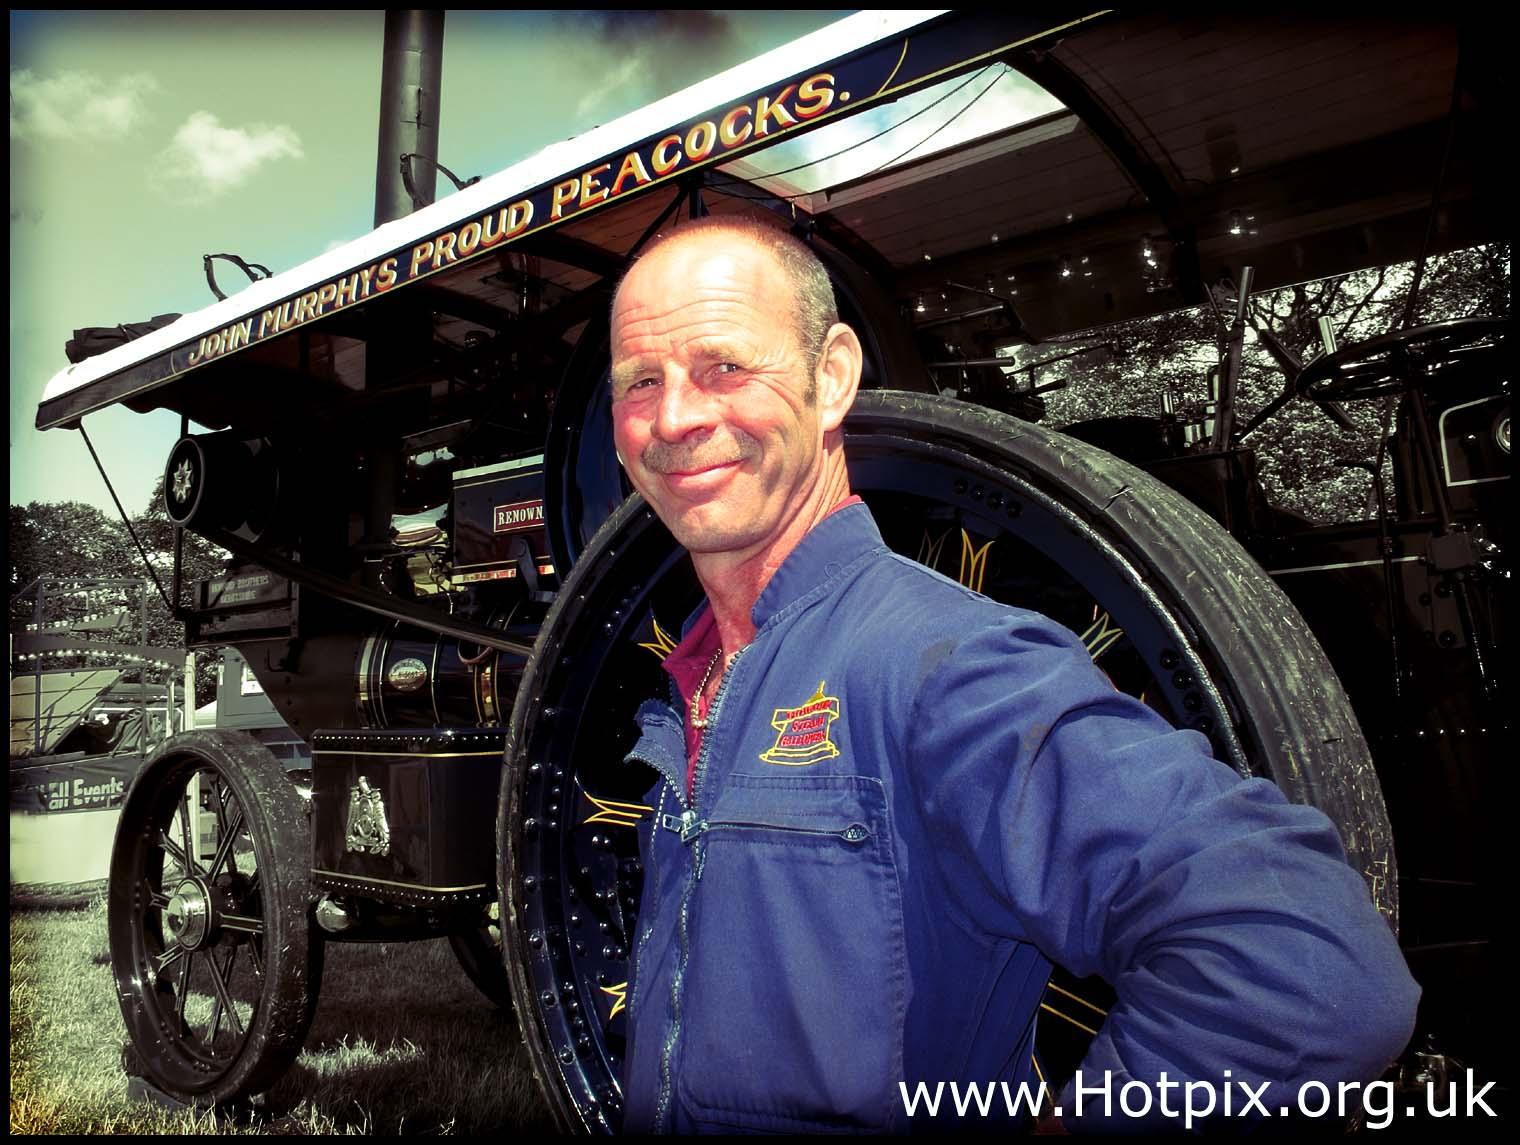 Cheshire,steam,Fair,Fayre,2011,Daresbury,Near,Warrington,Engine,Engines,Fowler,B6,Traction,july,Murphys,proud,Peacocks,UK,England,english,transport